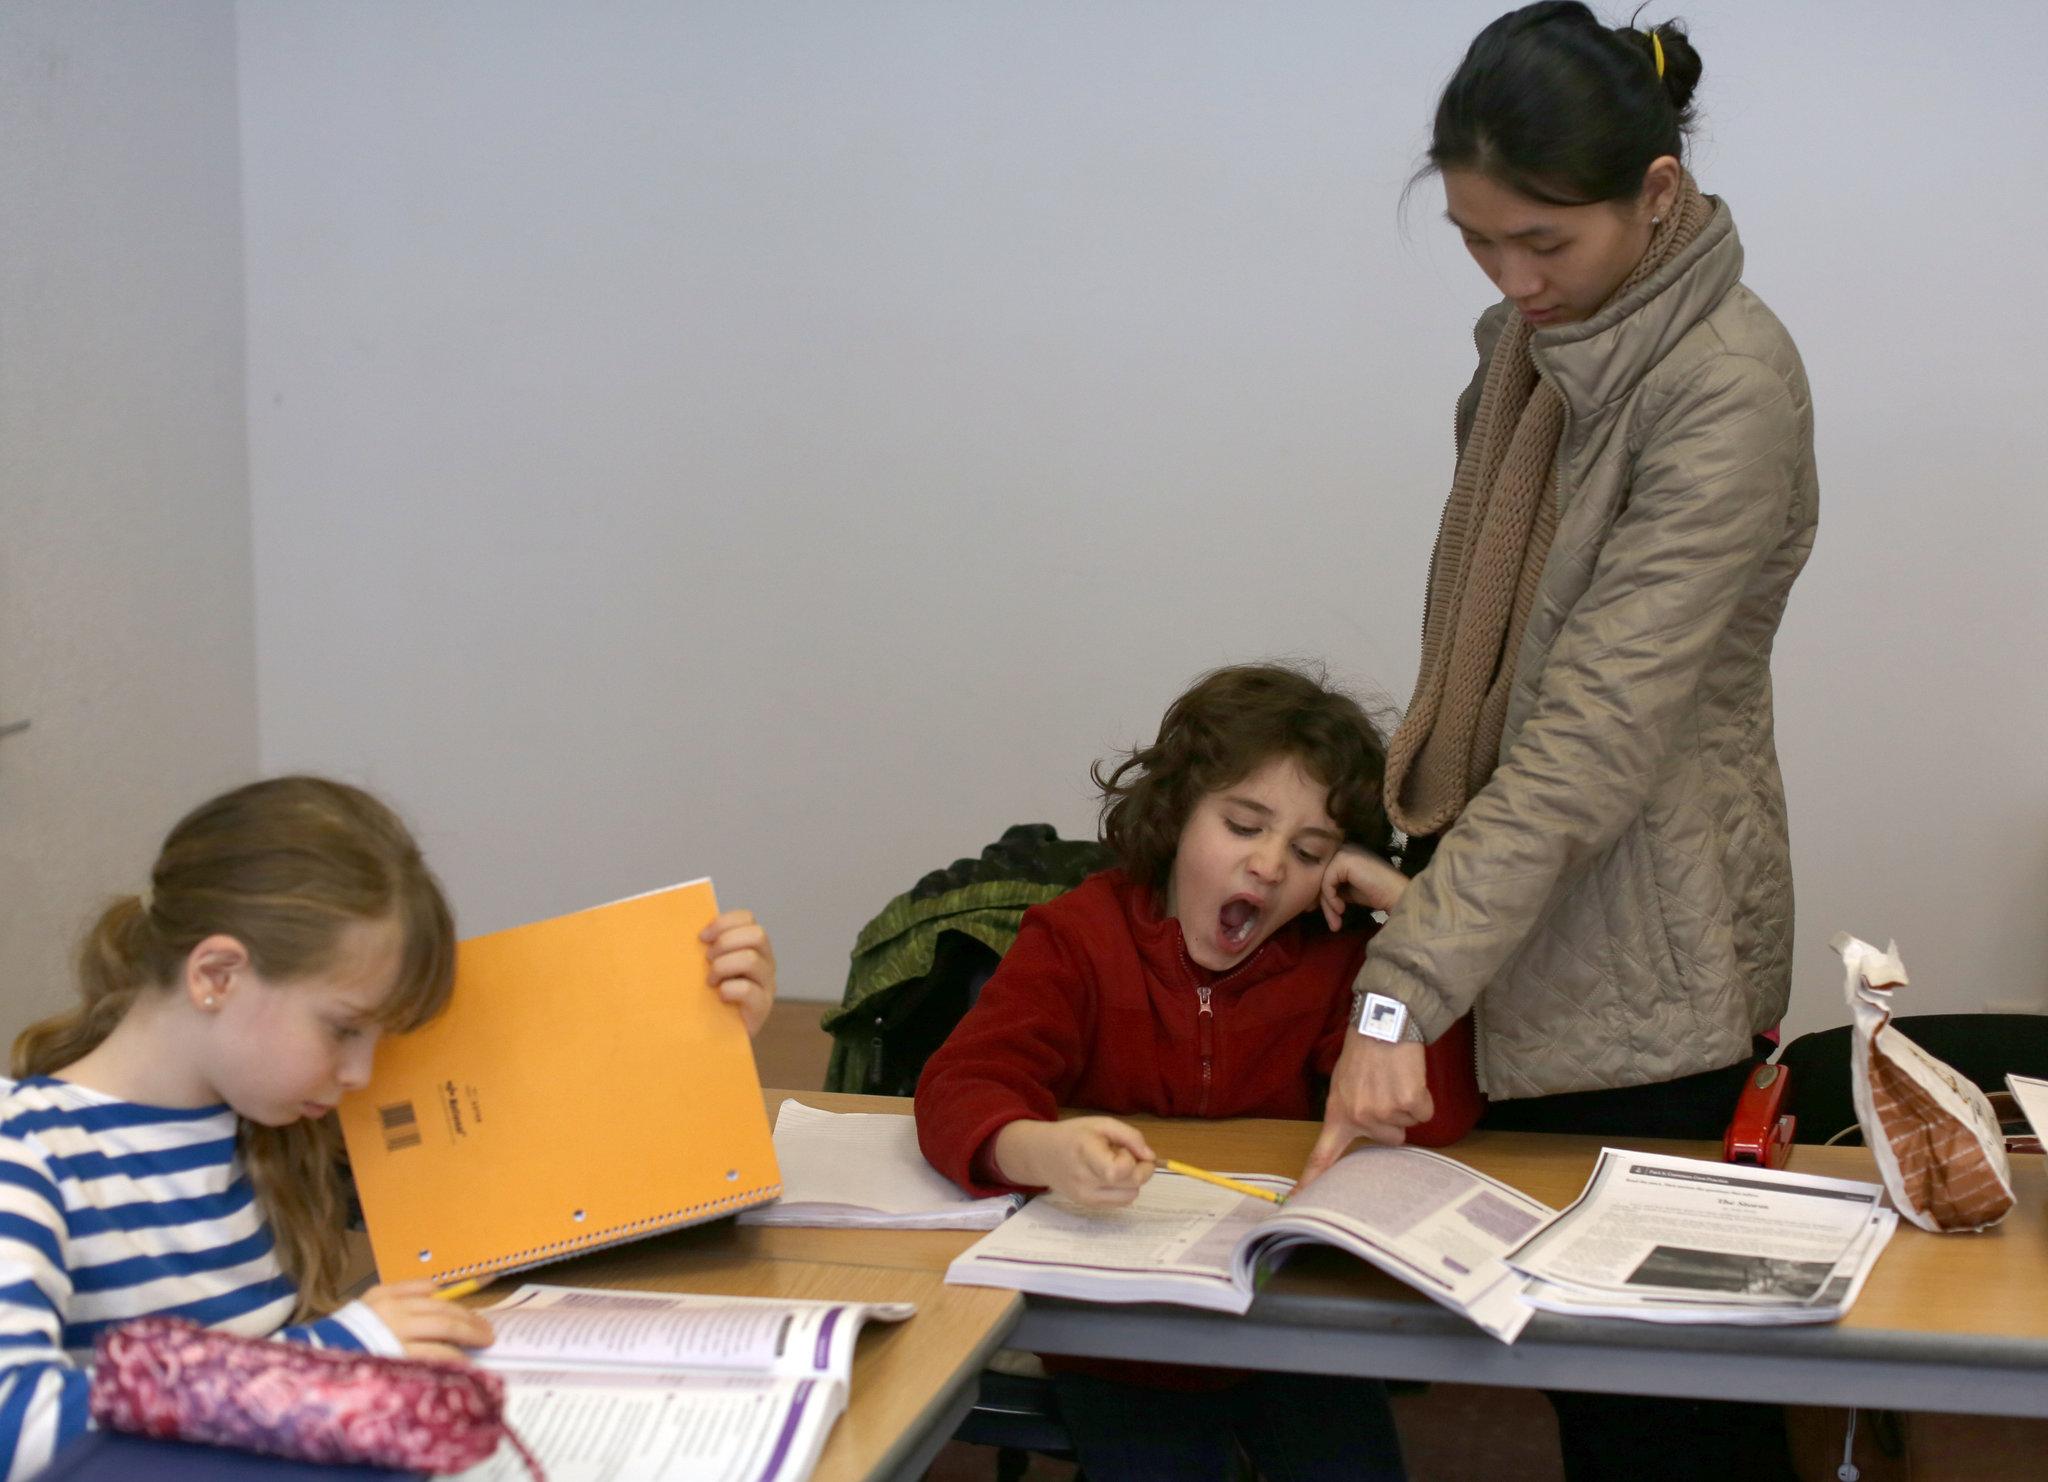 Cram Schools No Longer Just An Asian Pursuit